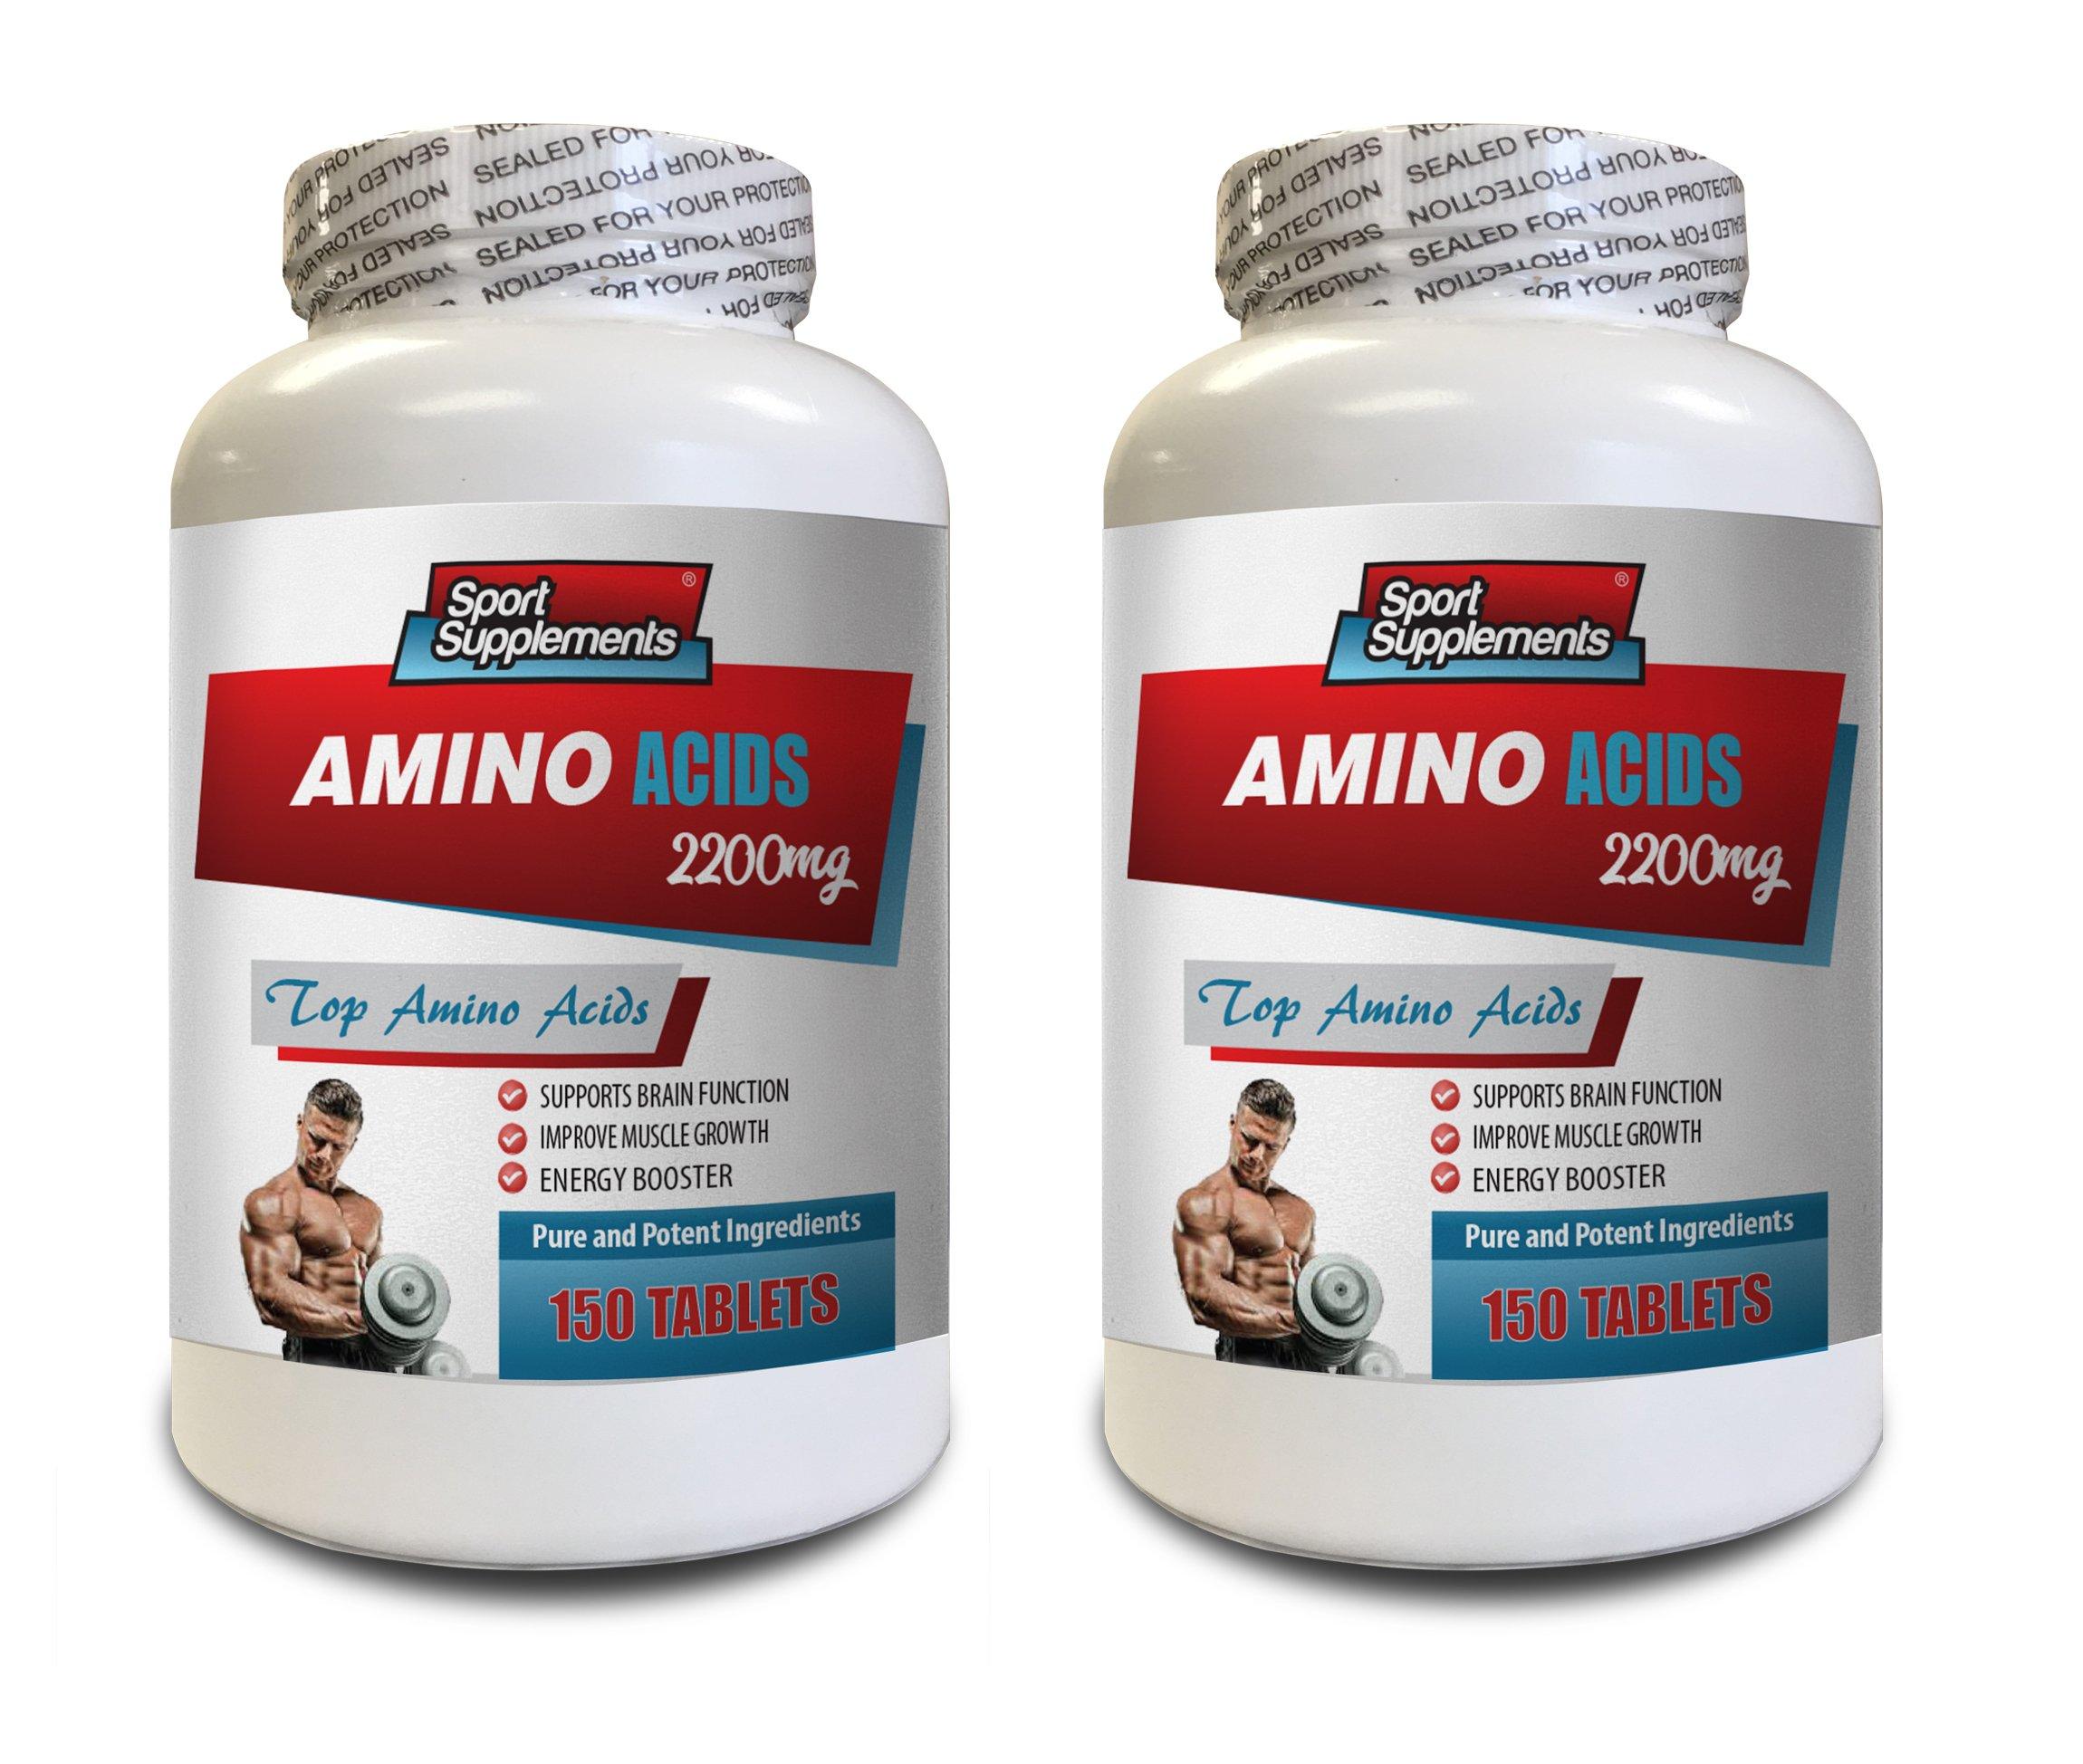 Muscle Pump Supplements - TOP Amino Acids 2200 mg - Amino Acids Bodybuilding - 2 Bottles 300 Tablets